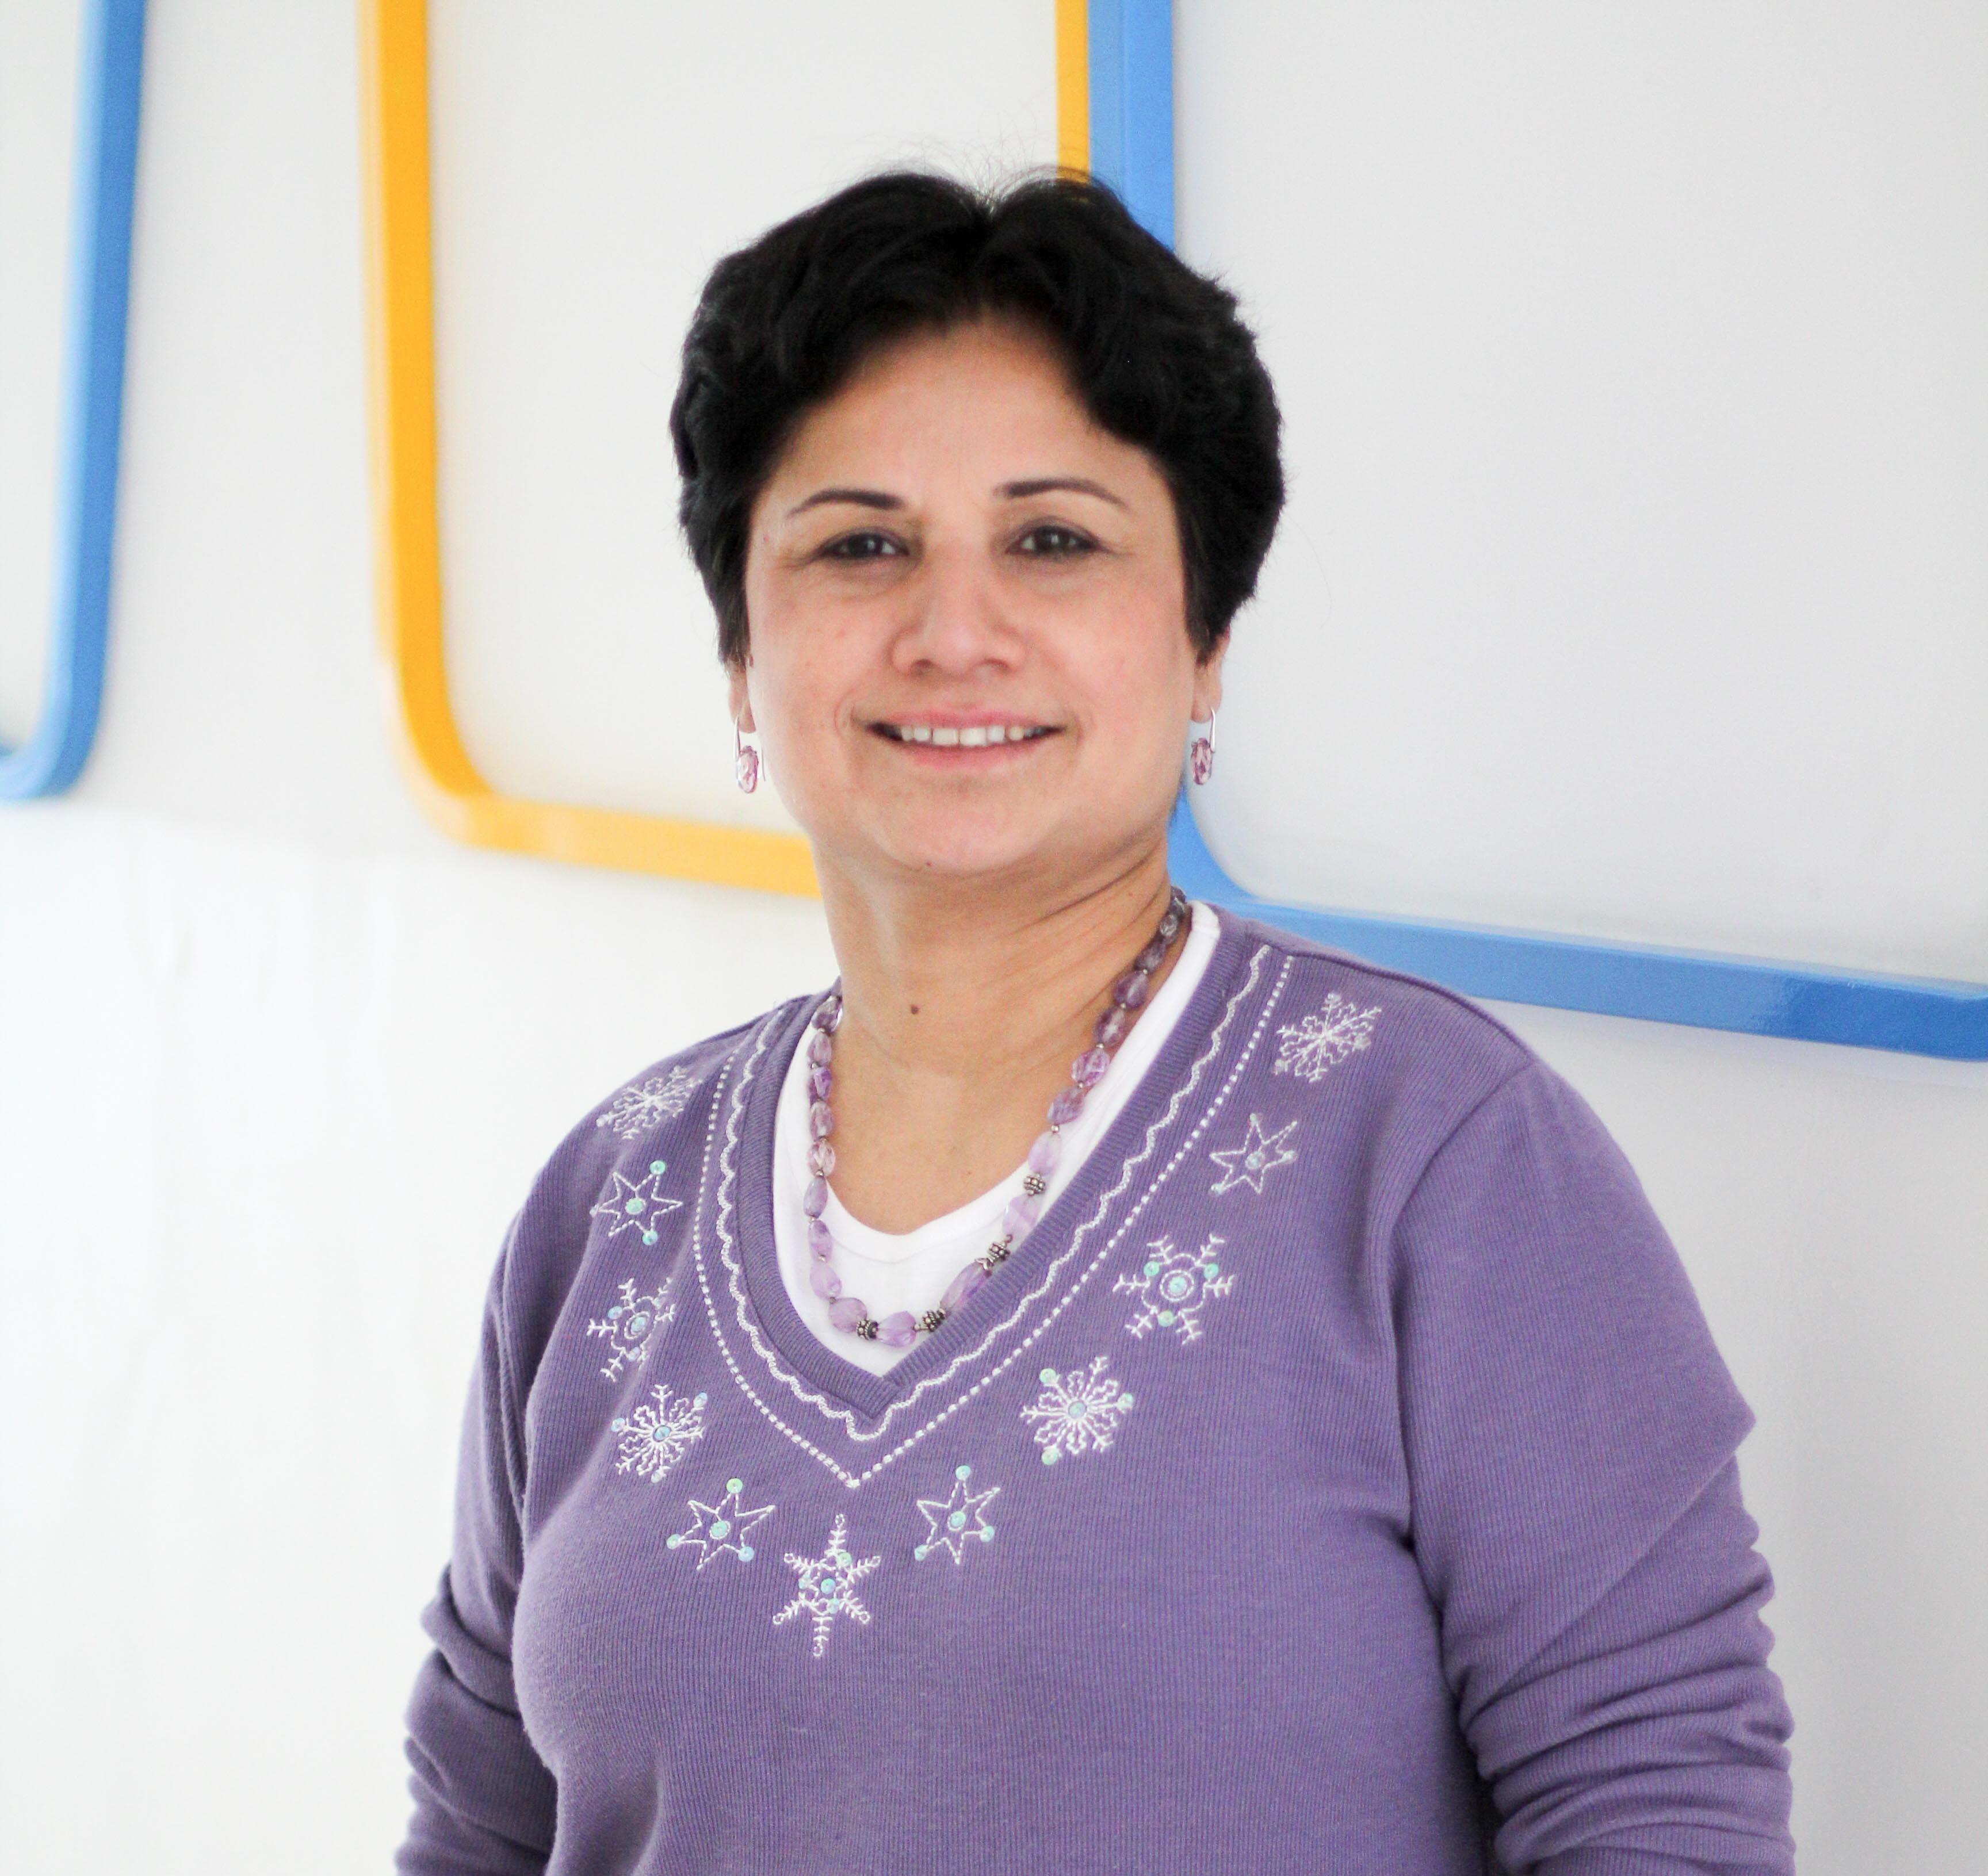 Jahnavi Katti